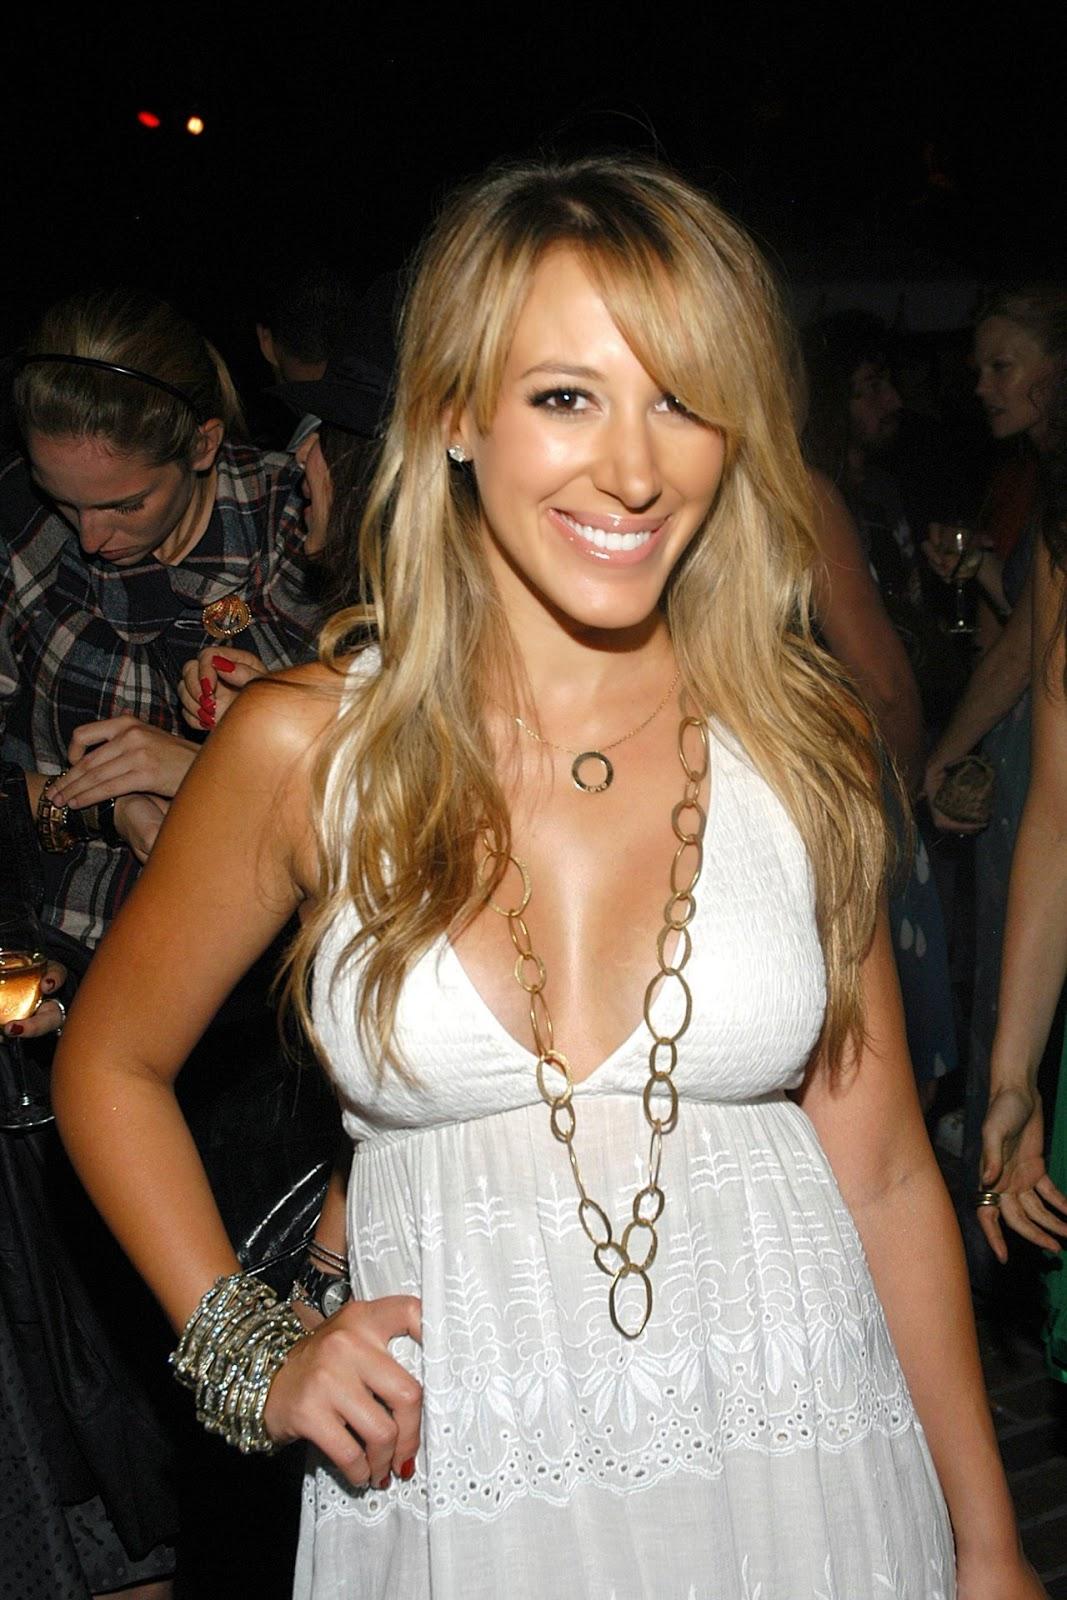 Pregnant Celebrities: Haylie Duff